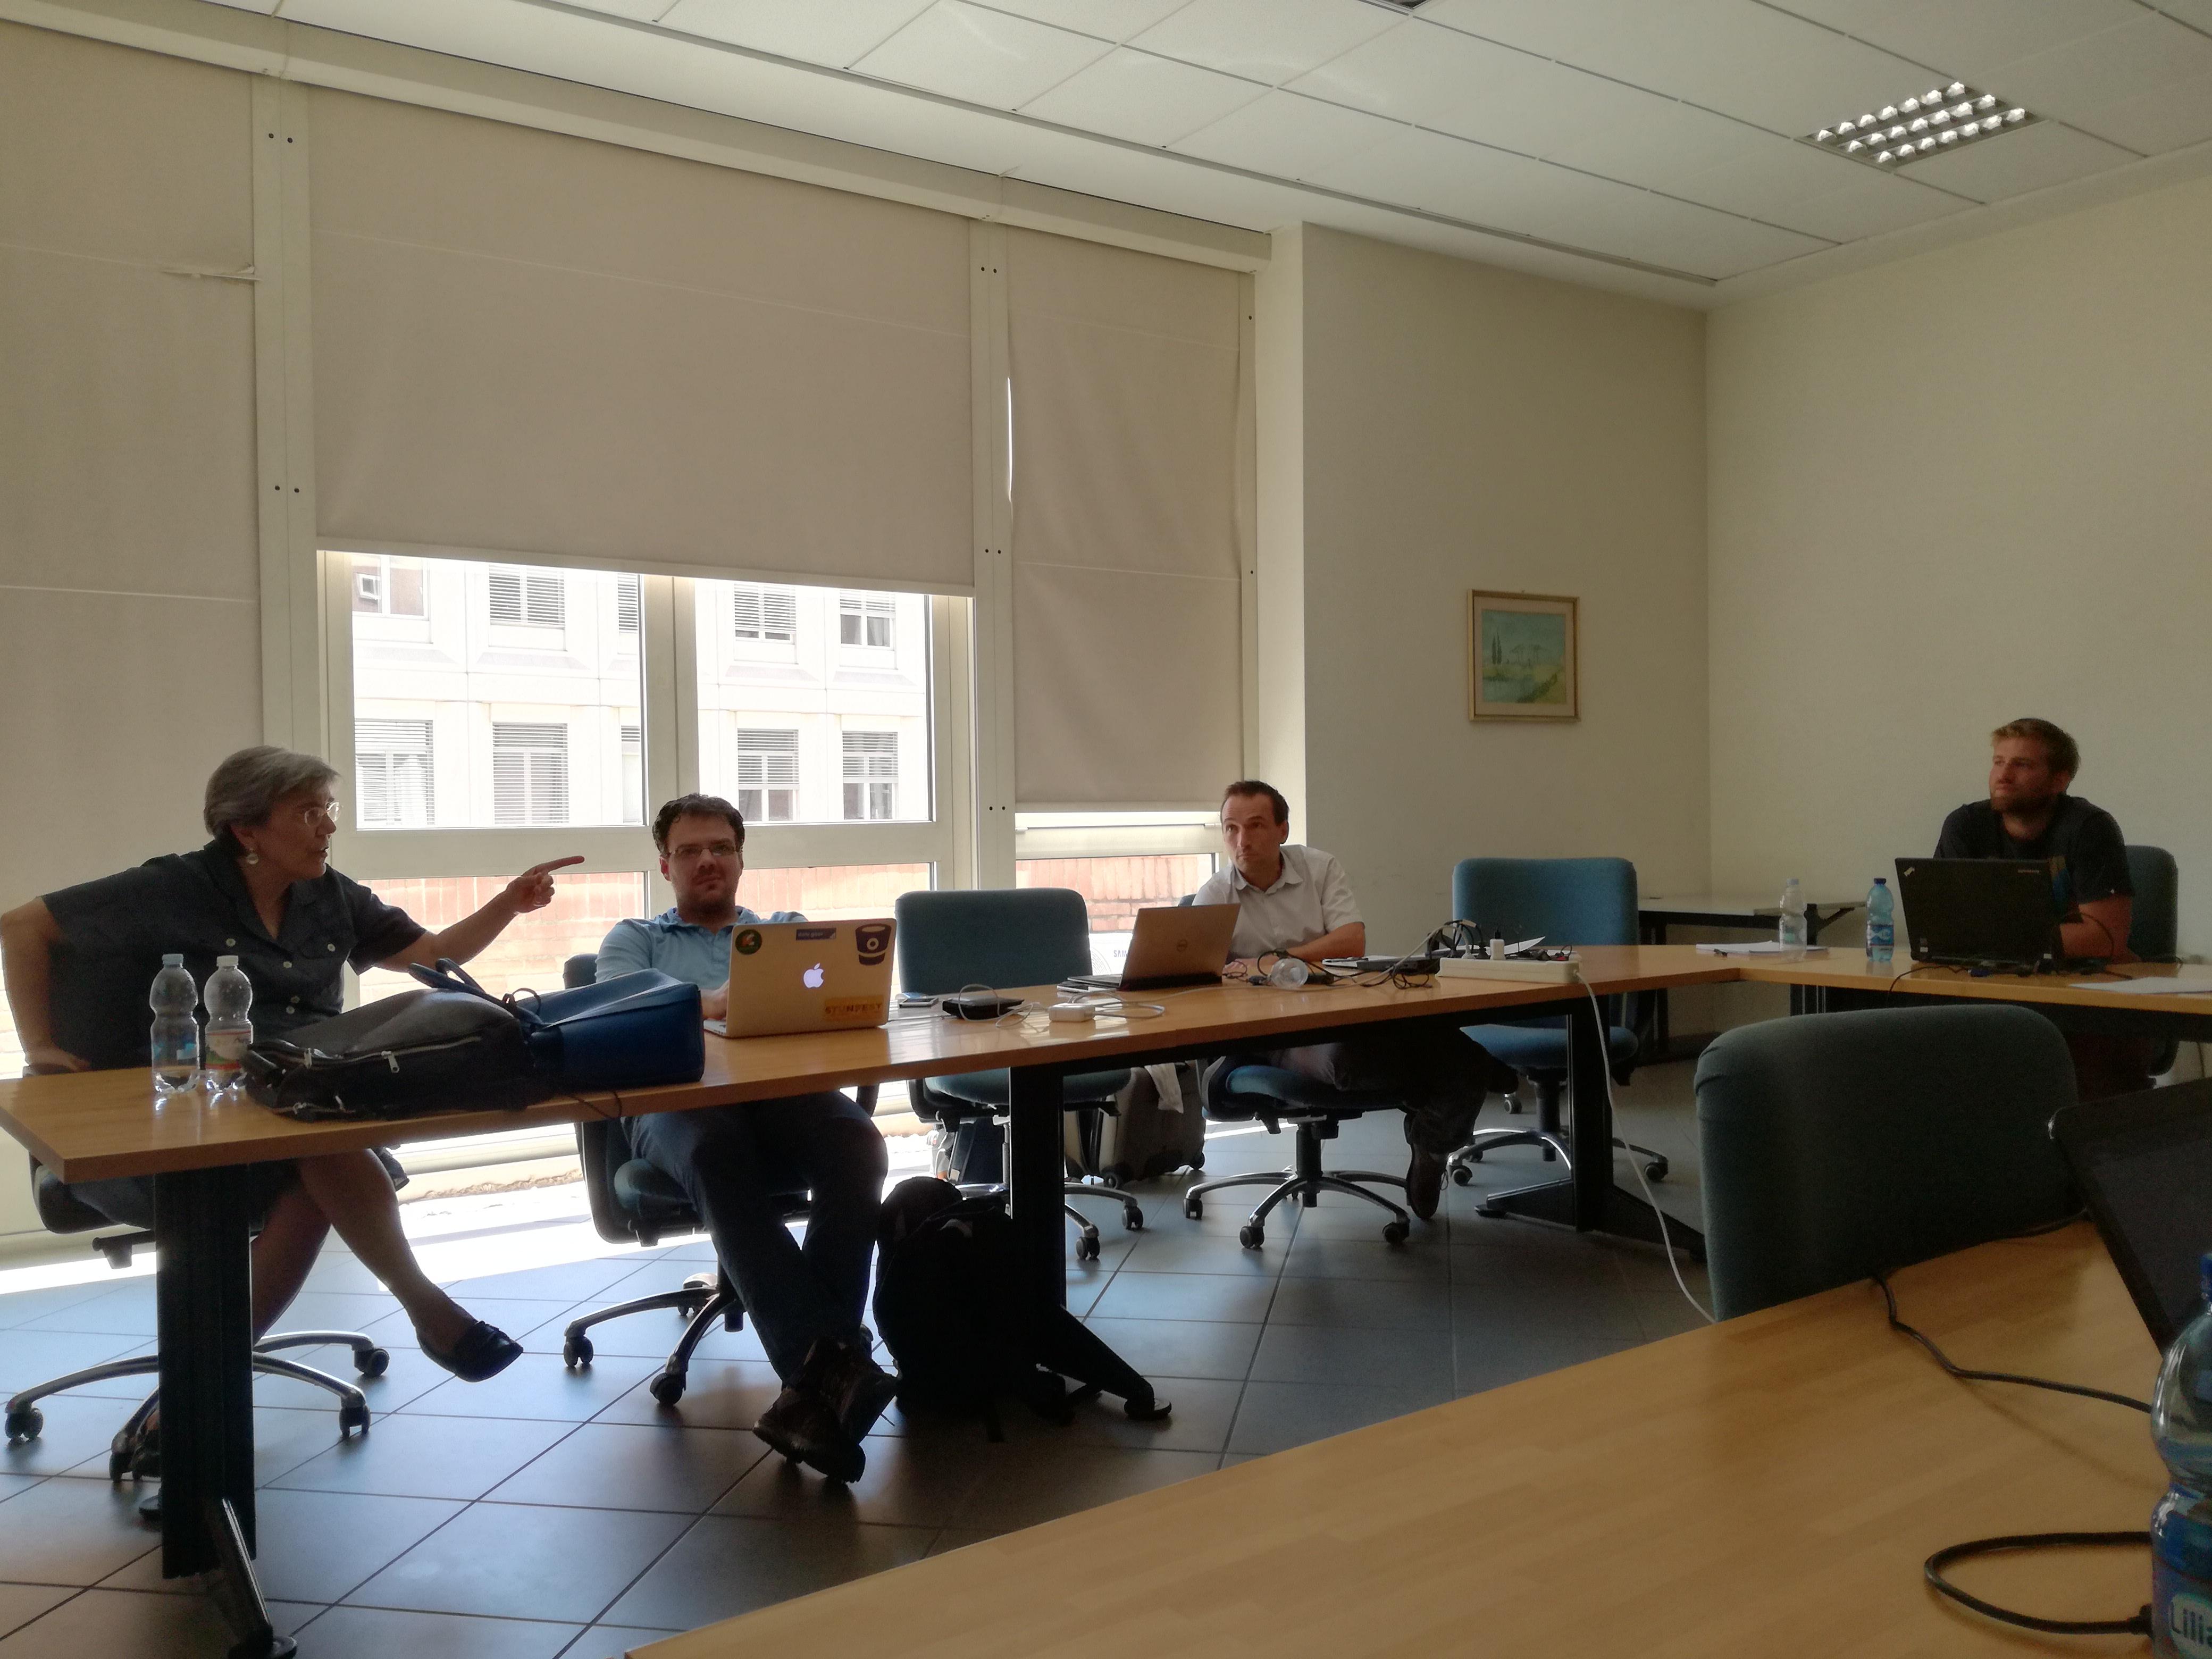 Kick-off meeting at the University of Modena and Reggio Emilia